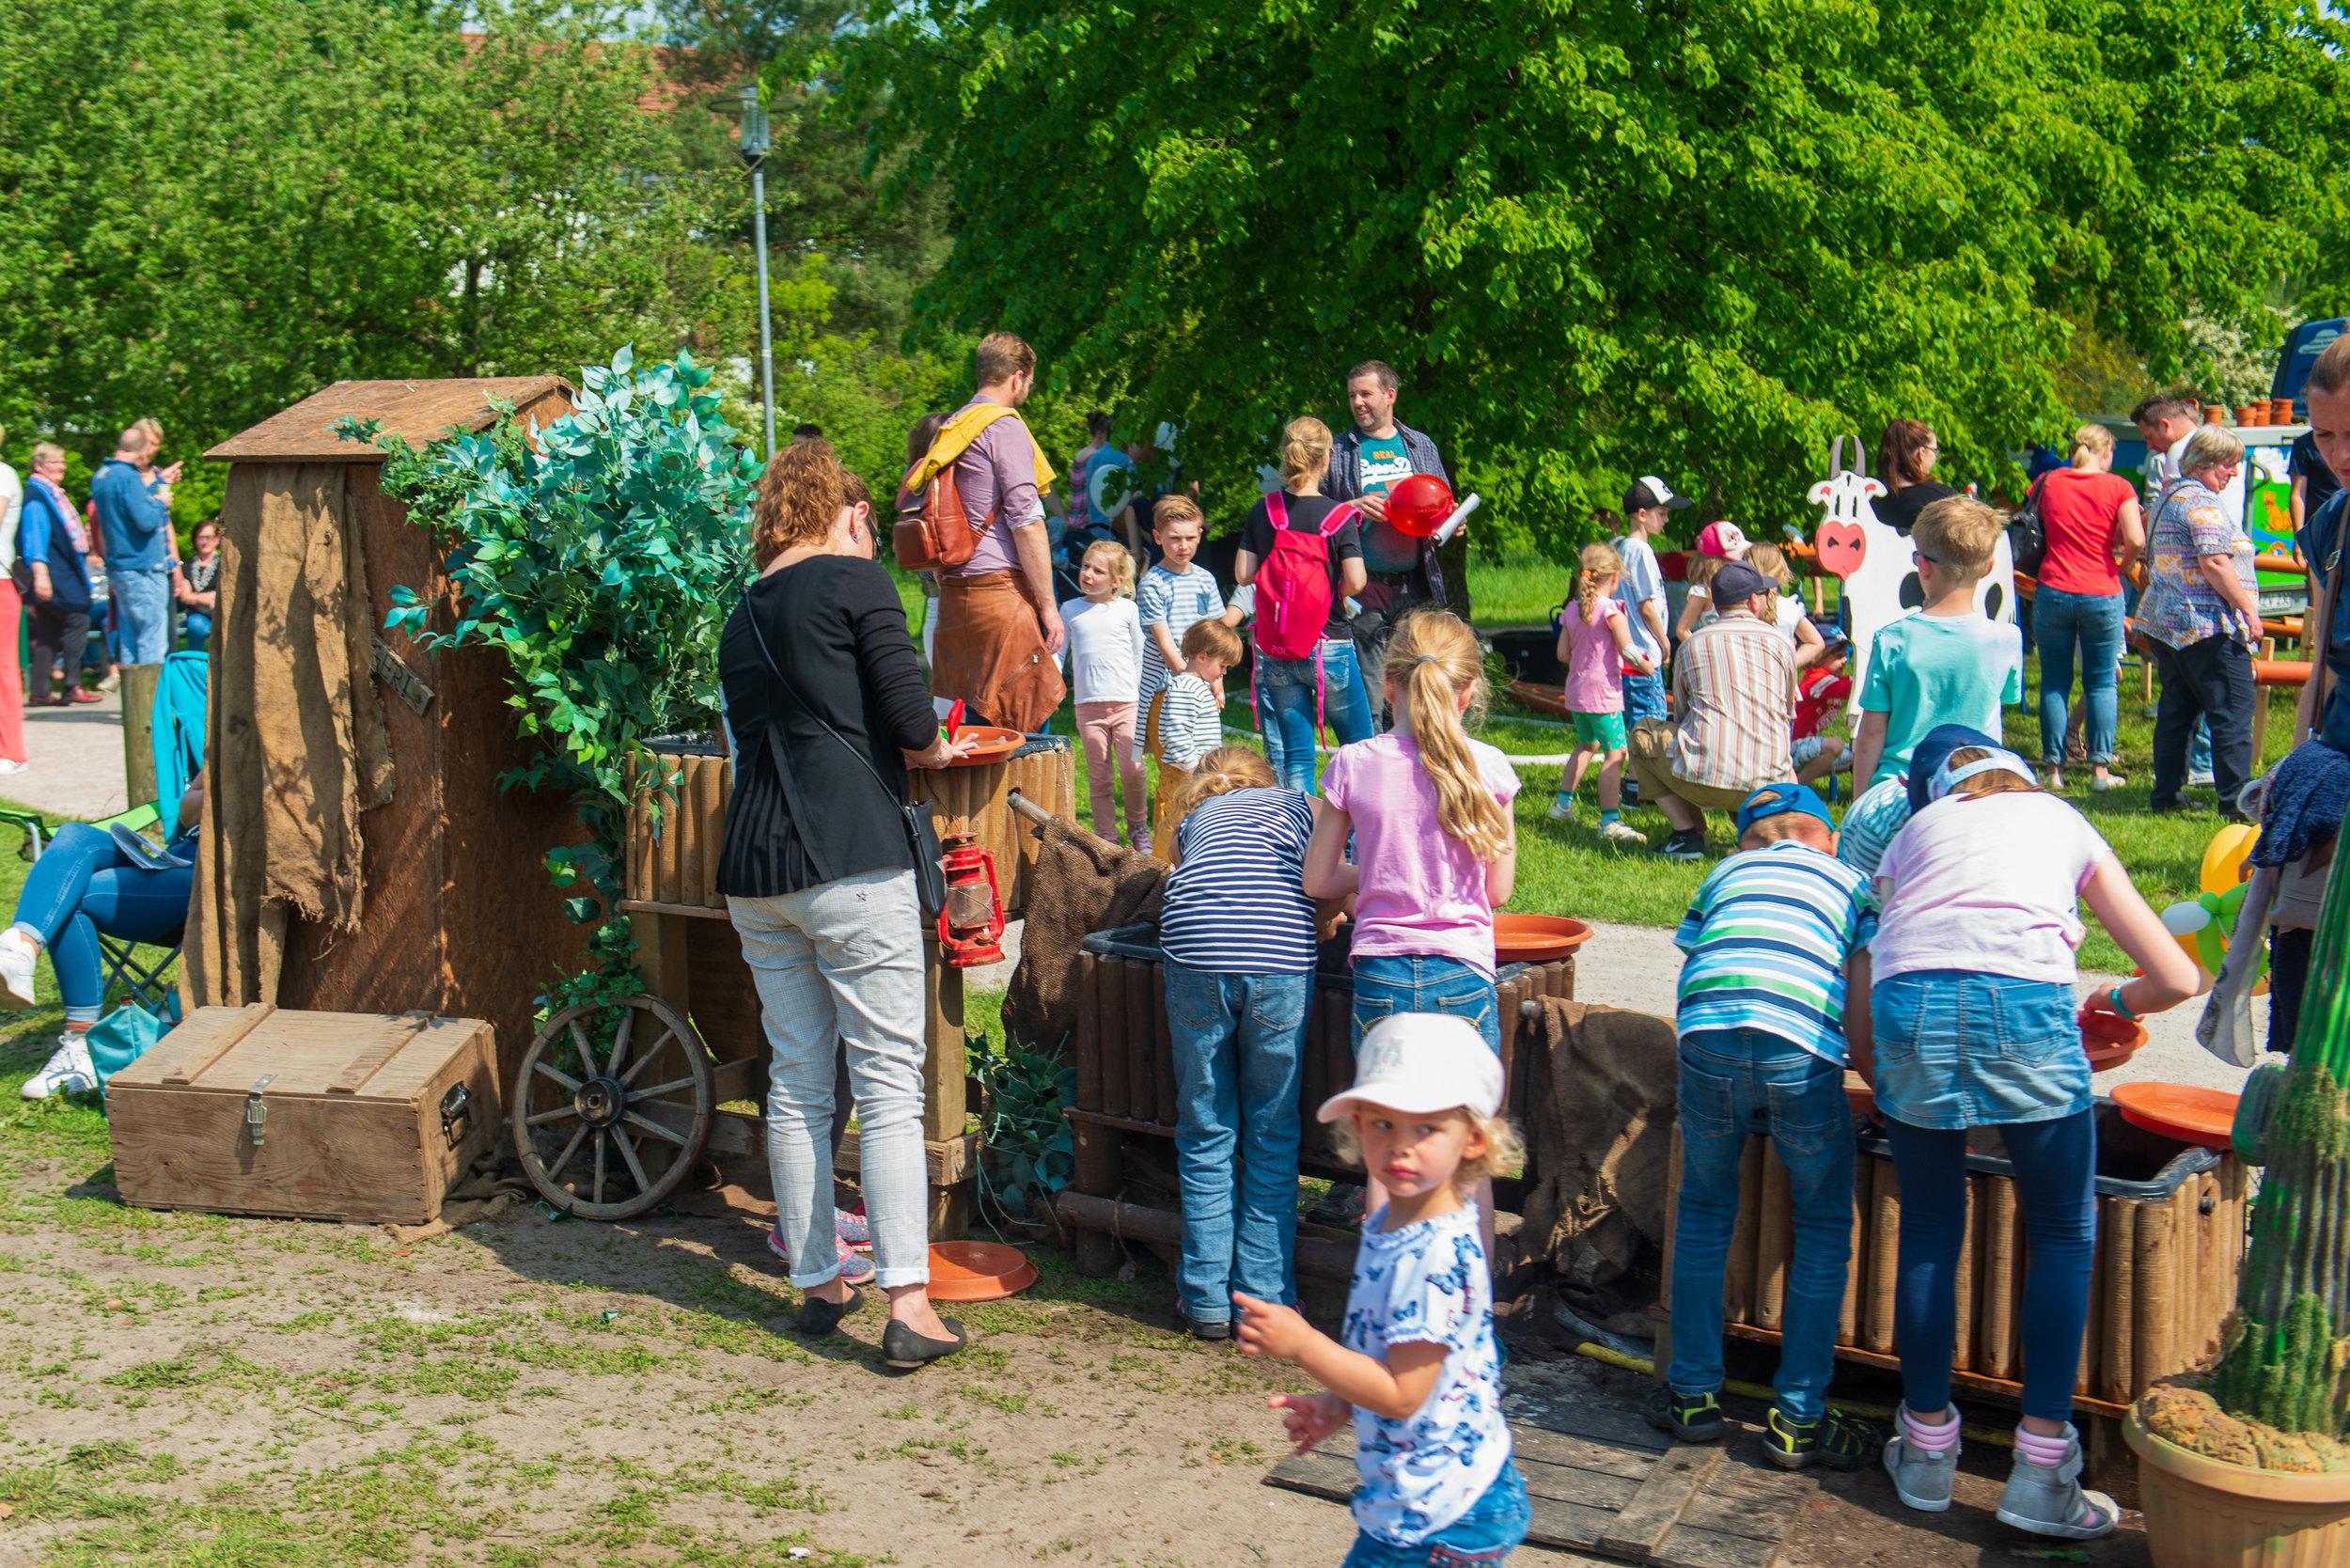 13-Norderstedter-Museumsfest-2019-FWM--XO-Dennys-Mamero-WEB-57.jpg